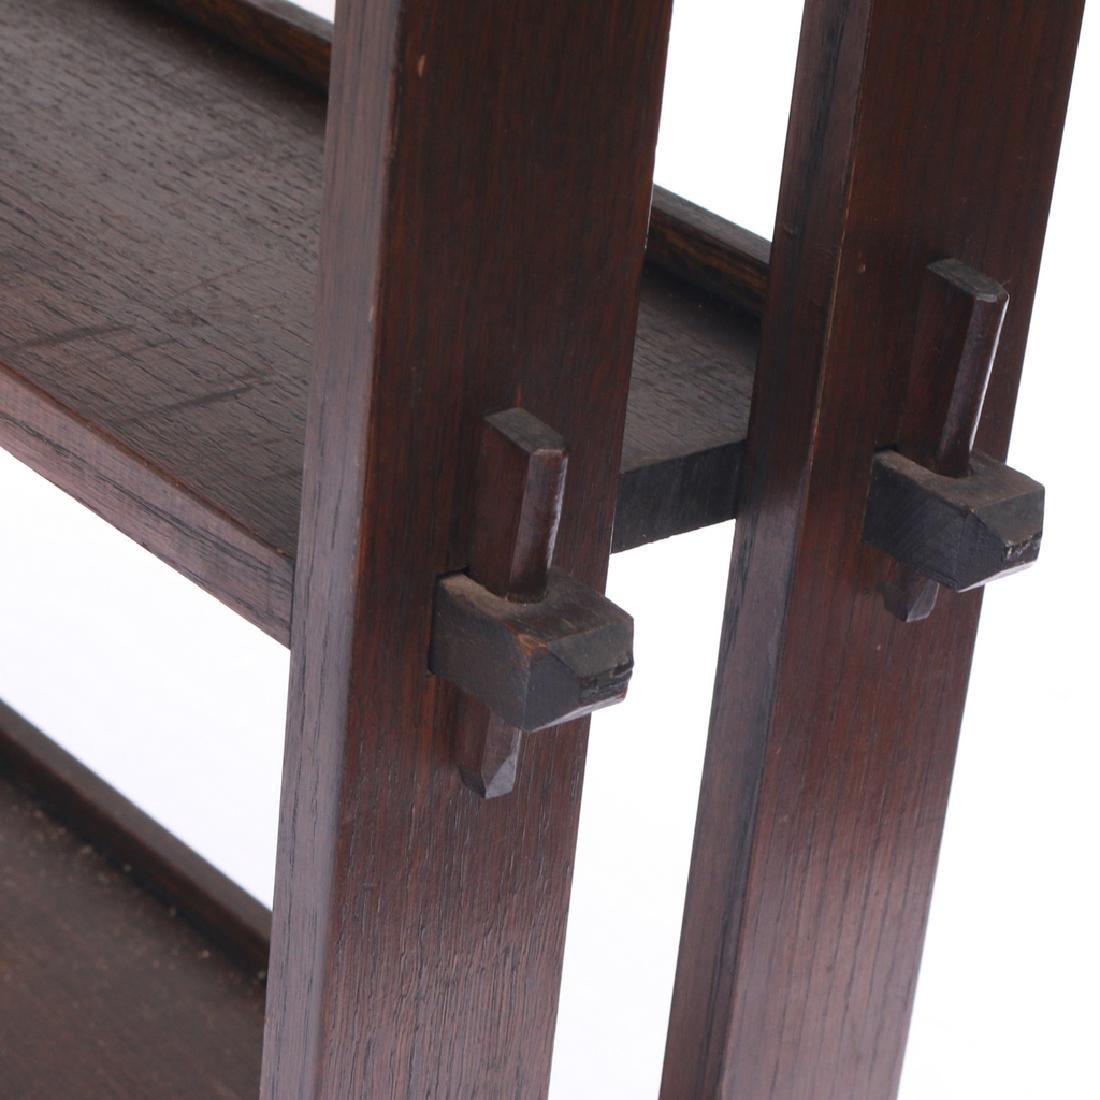 ROYCROFT SIDE TABLE - 6